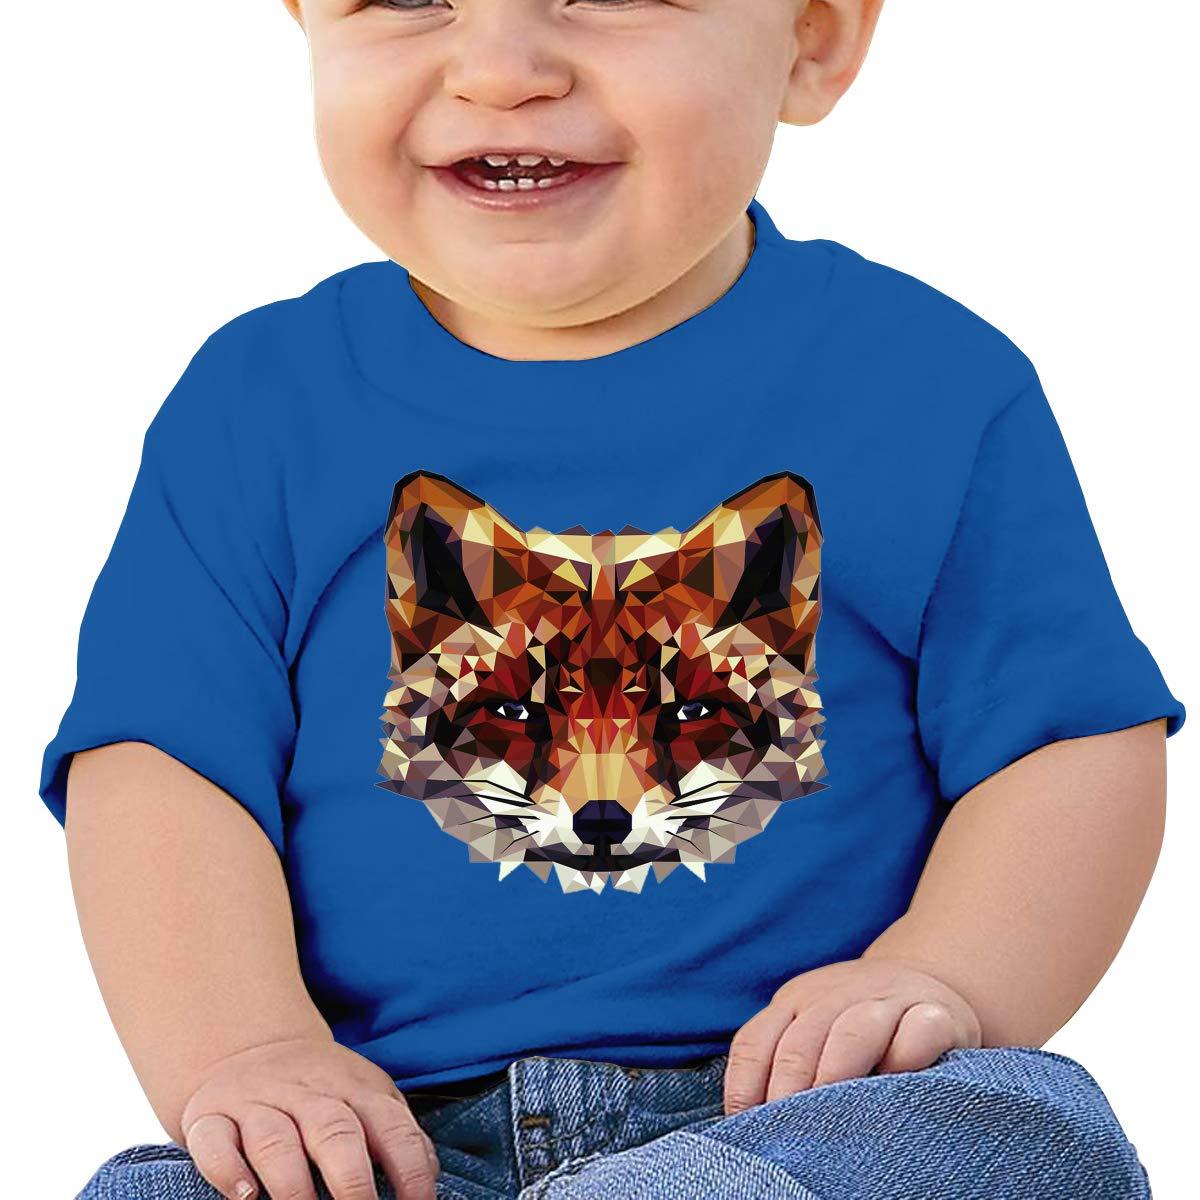 XHX403 Geometric Low Poly Fox Infant Kids T Shirt Cotton Tee Toddler Baby 6-18M